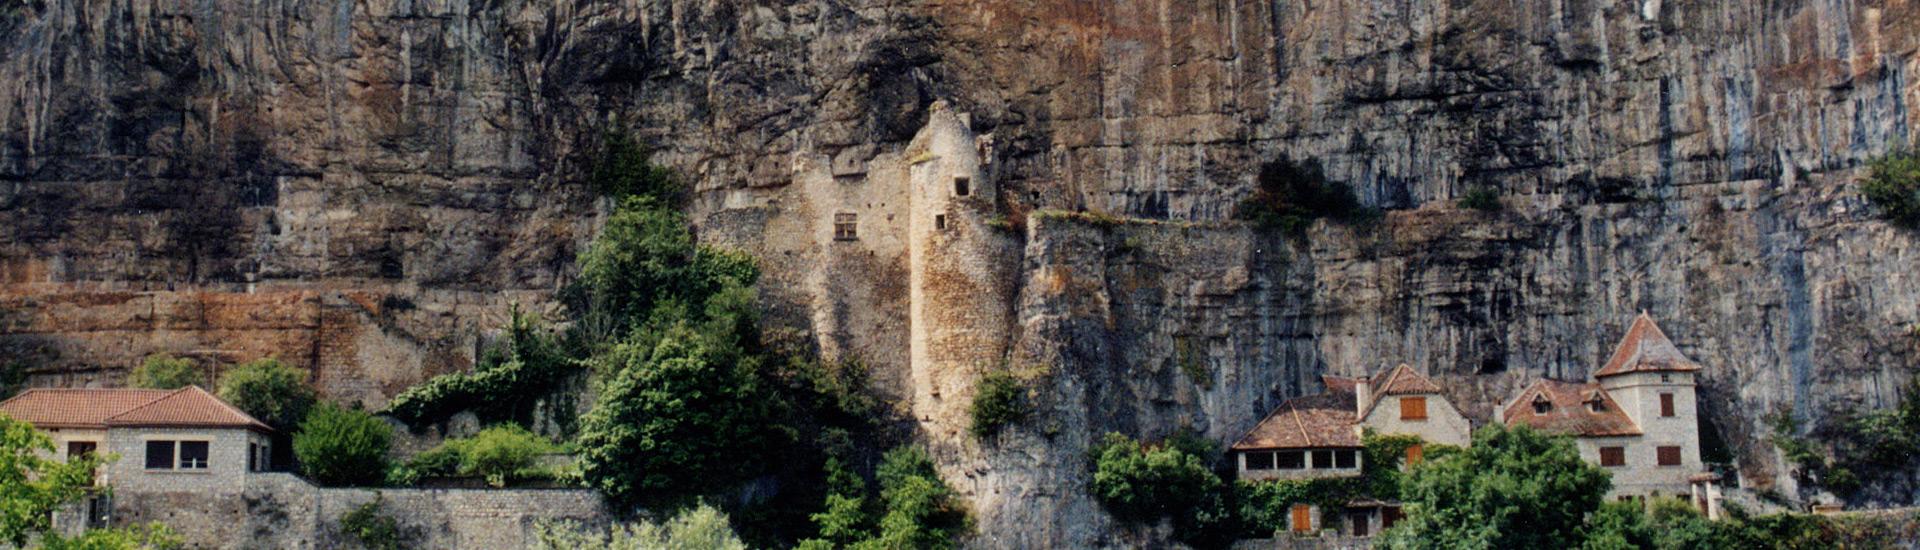 Chateau de Cabrerets